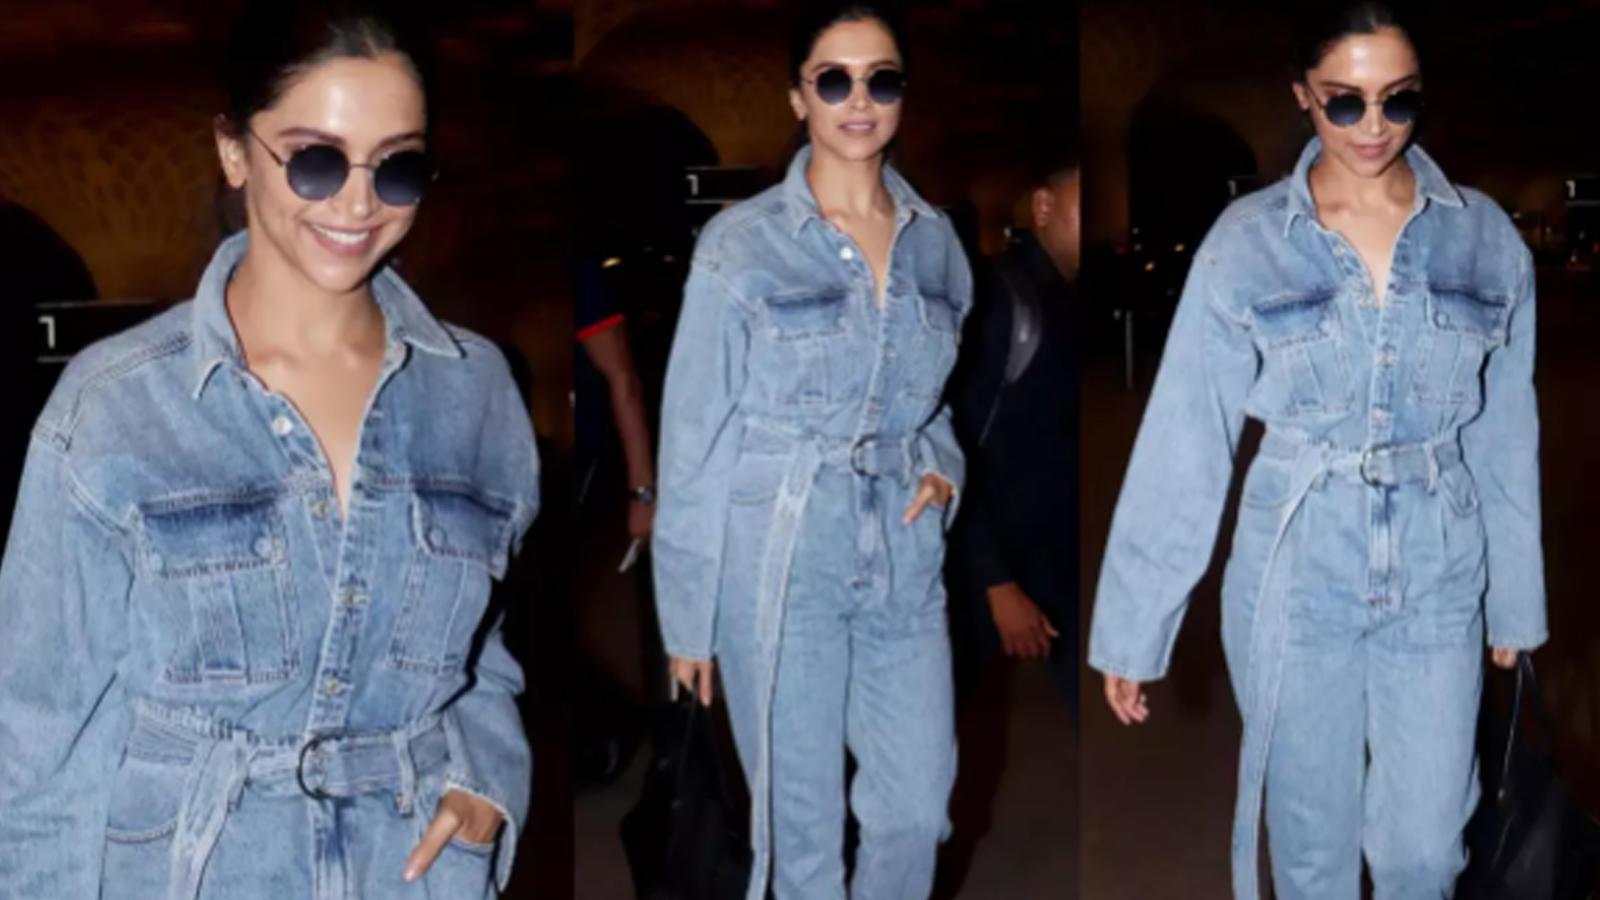 Airport diaries: Deepika Padukone nails denim look, Kriti Sanon looks pretty in lime dress